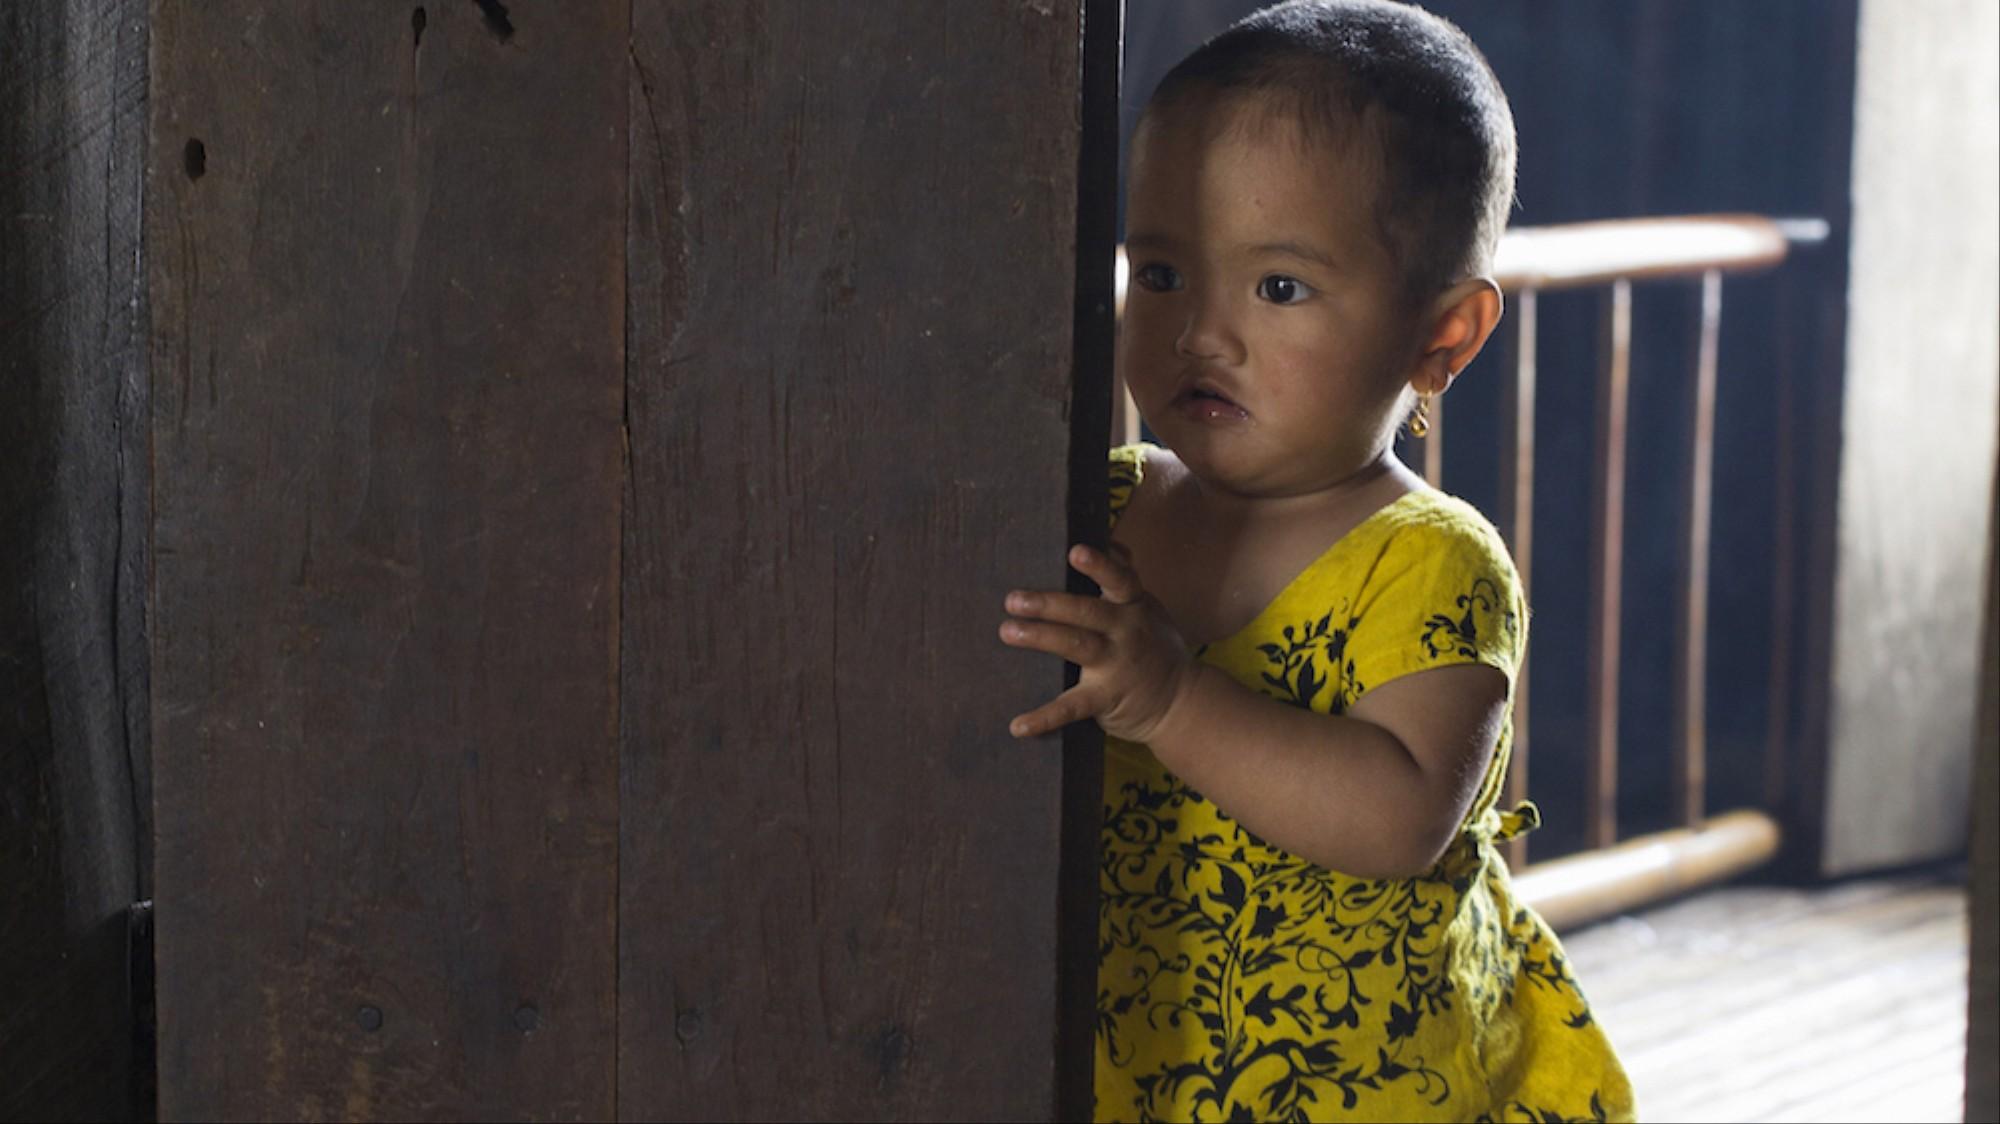 Photos of a Matrilineal Society in India - VICE